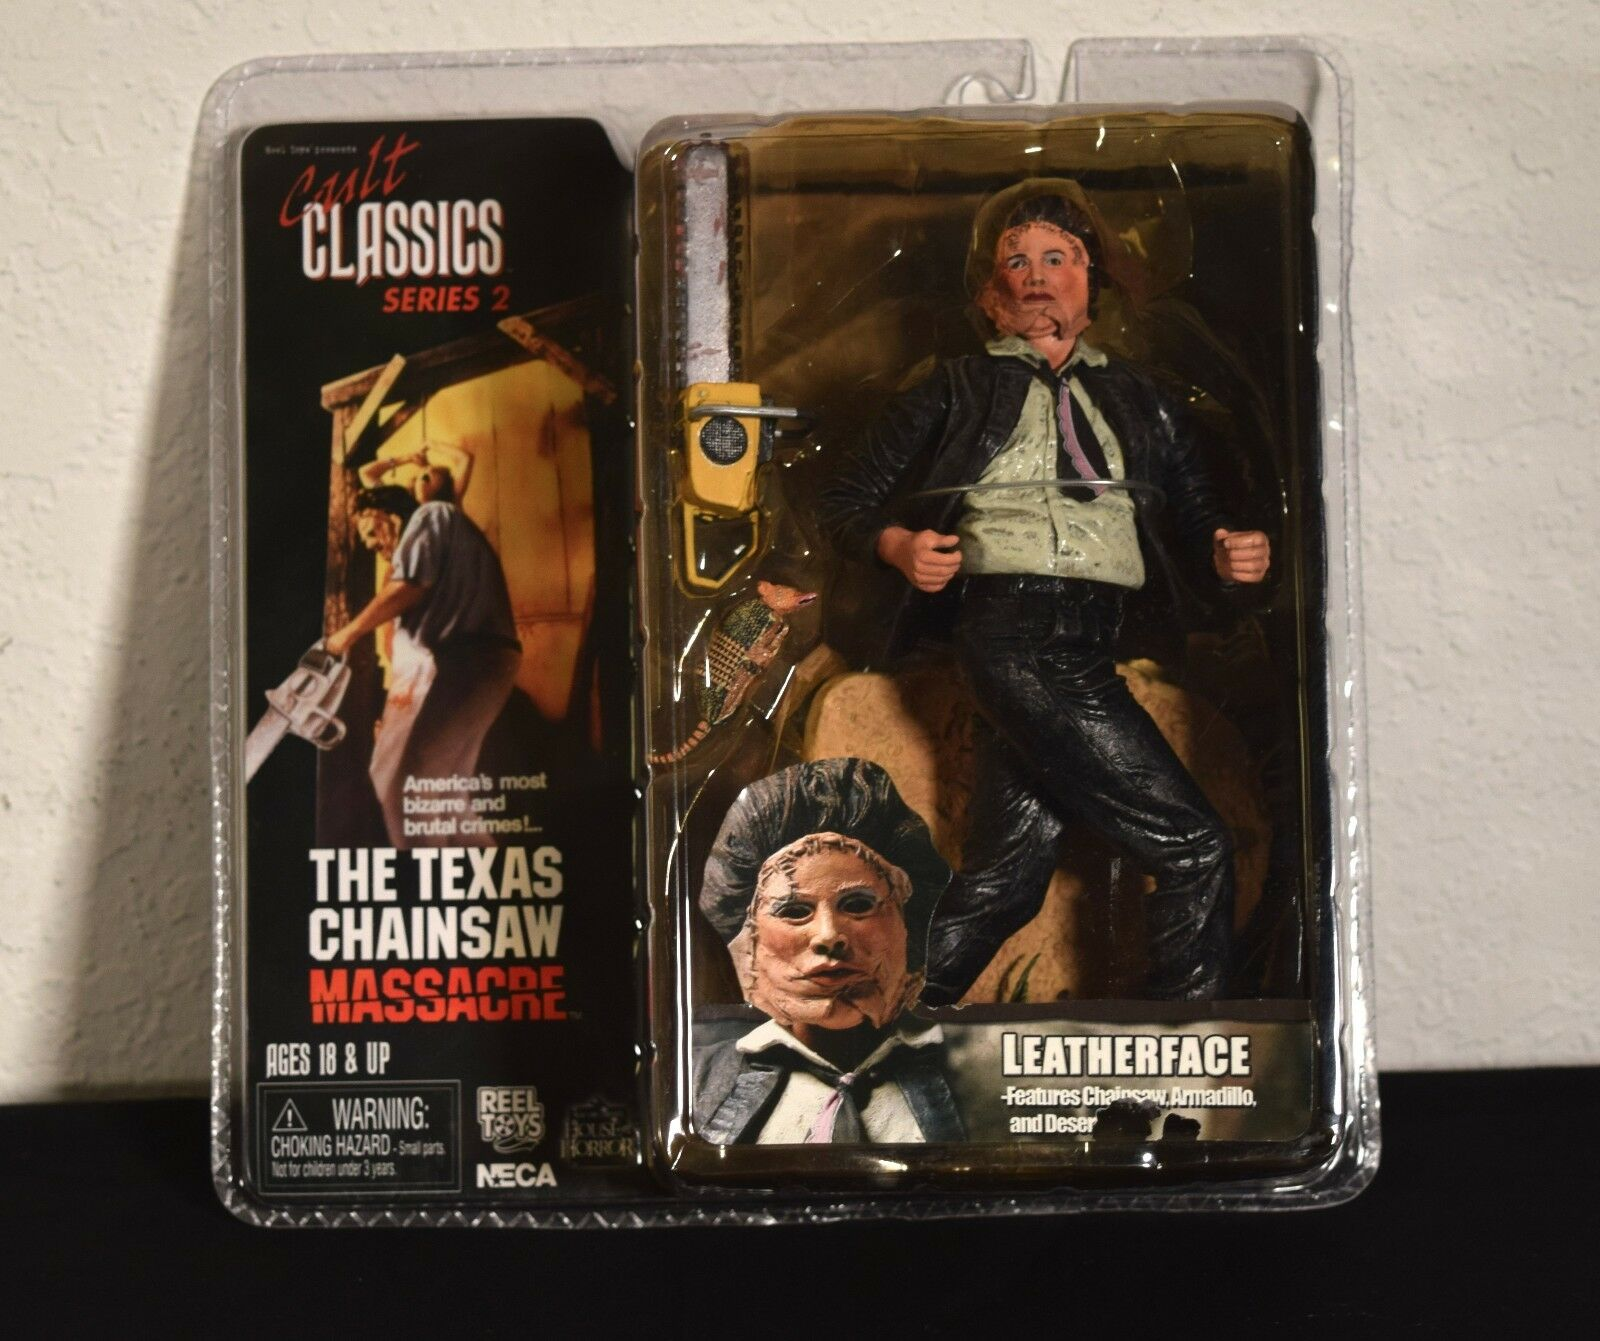 NECA Cult Classics series 2. 2. 2. Leatherface Texas Chainsaw Massacre Unopened. MIB. be6df2